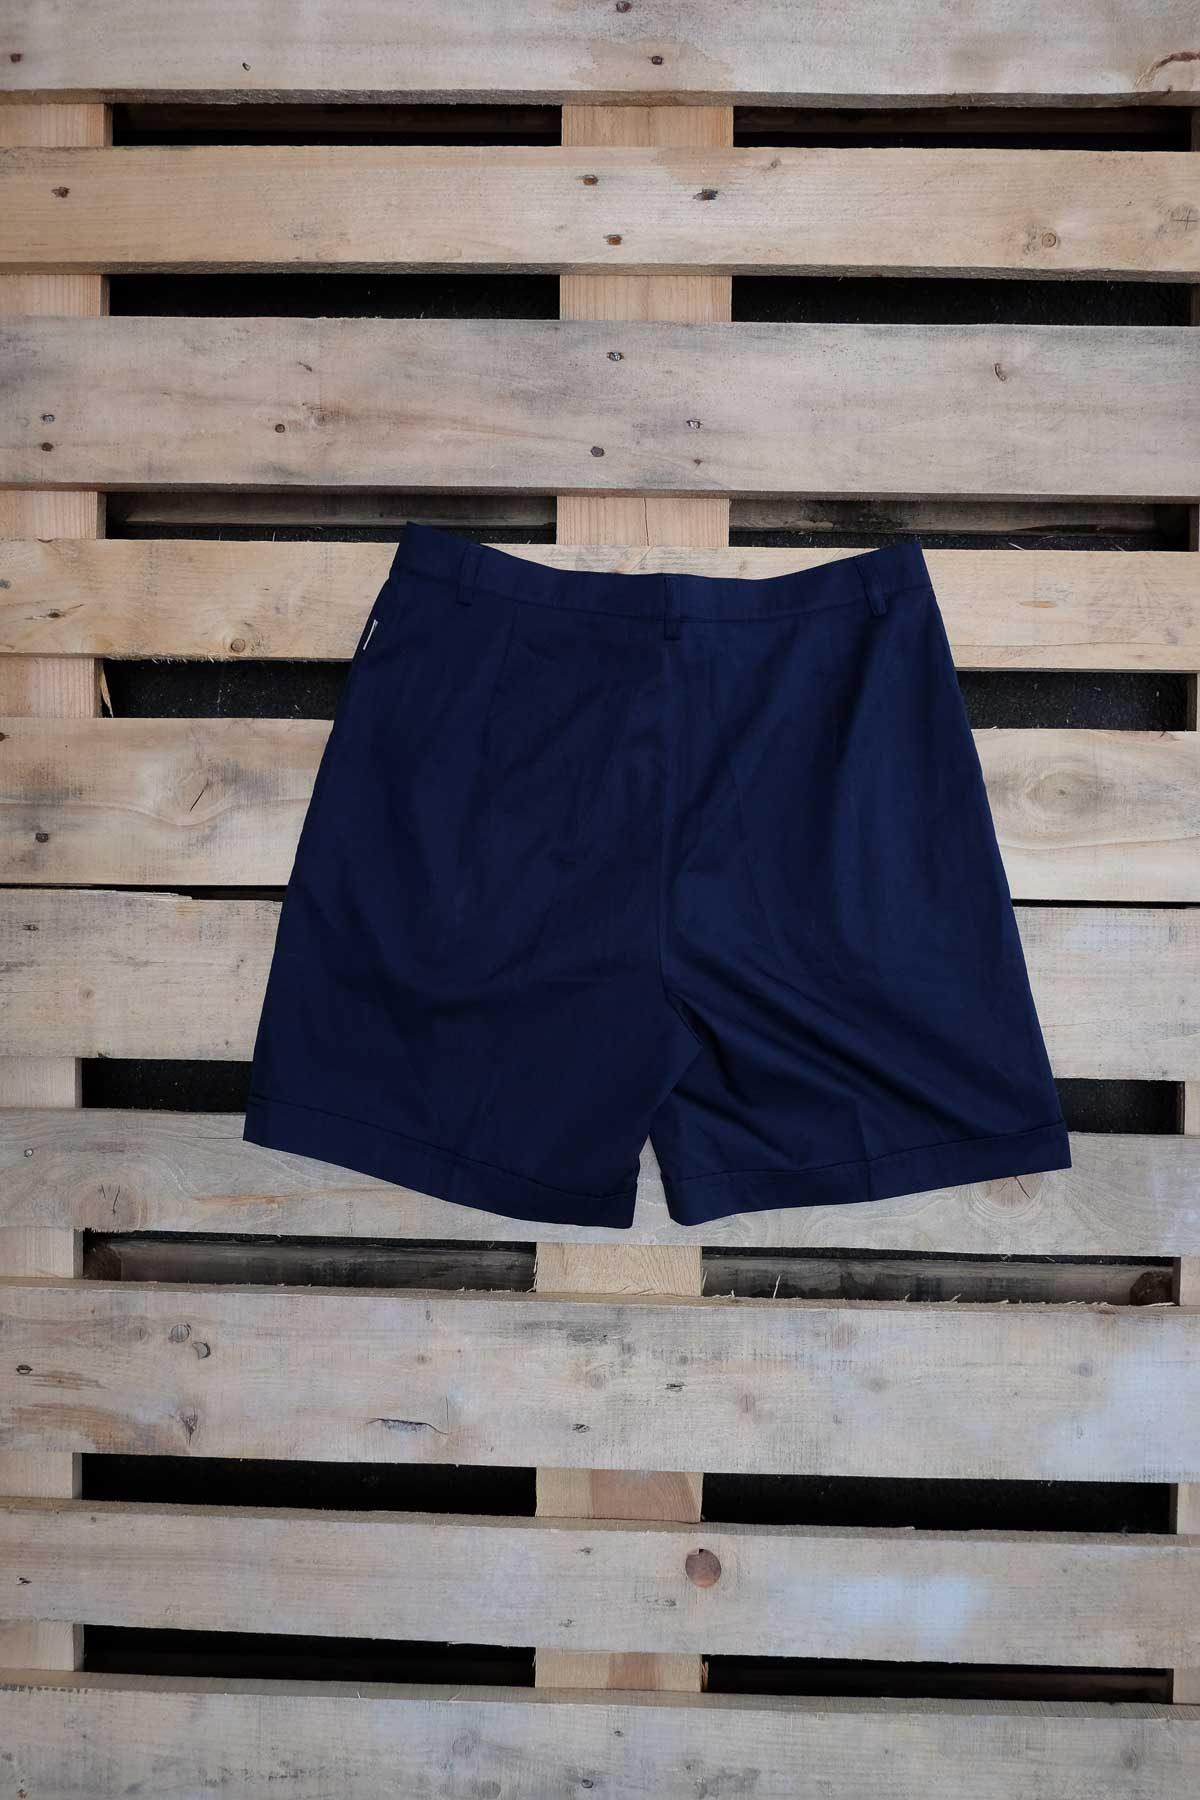 Adidas PANTALONCINO VINTAGE Blue M